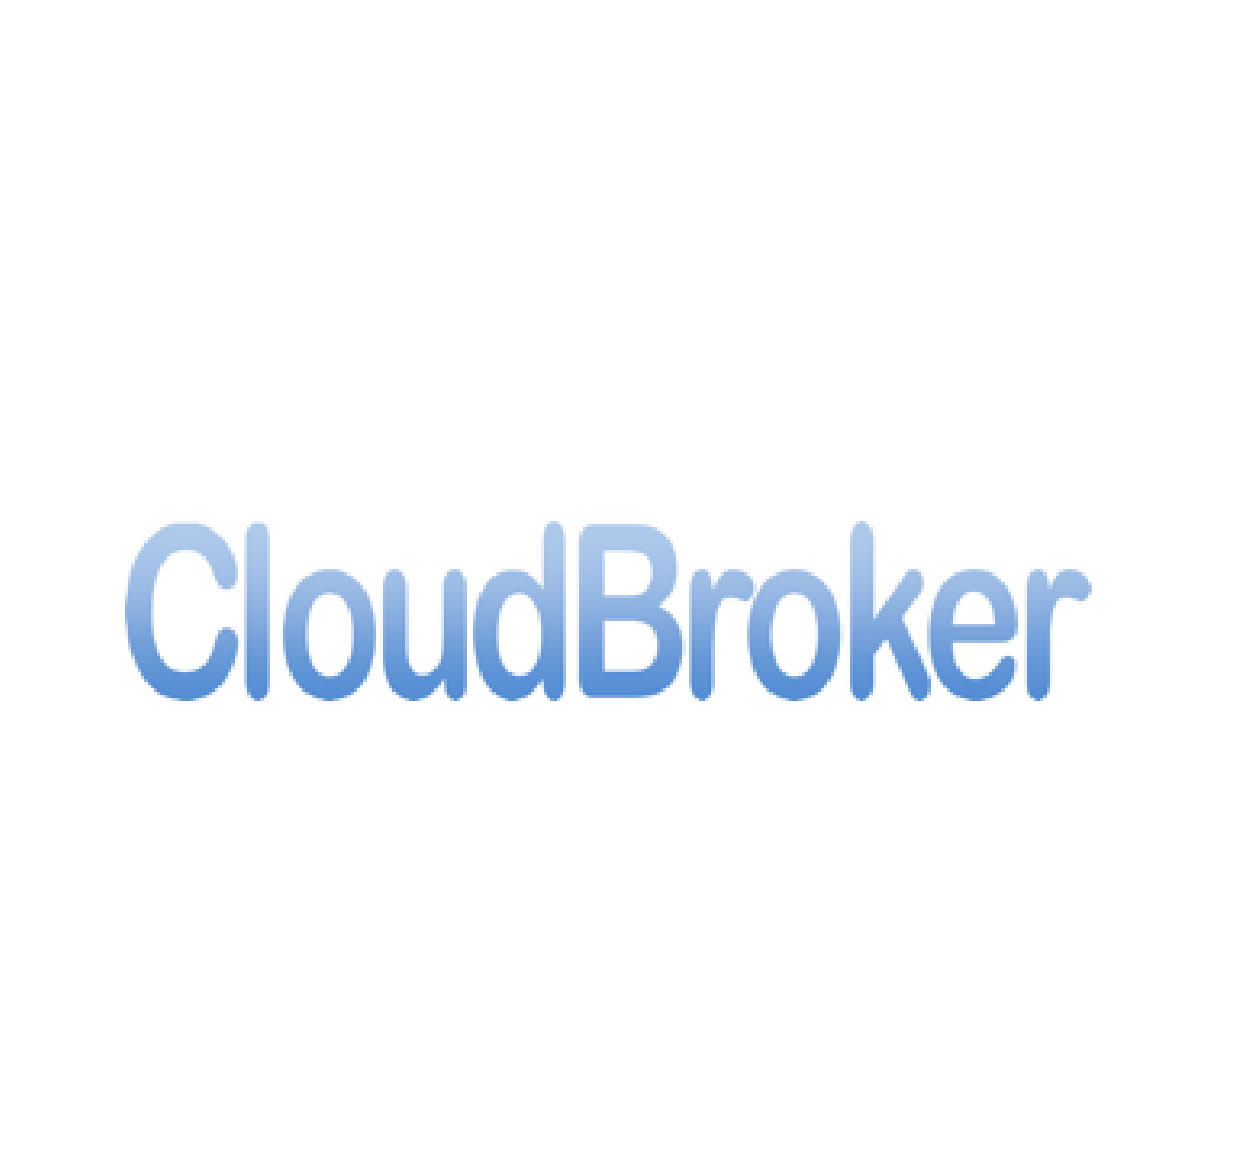 CloudBroker GmbH